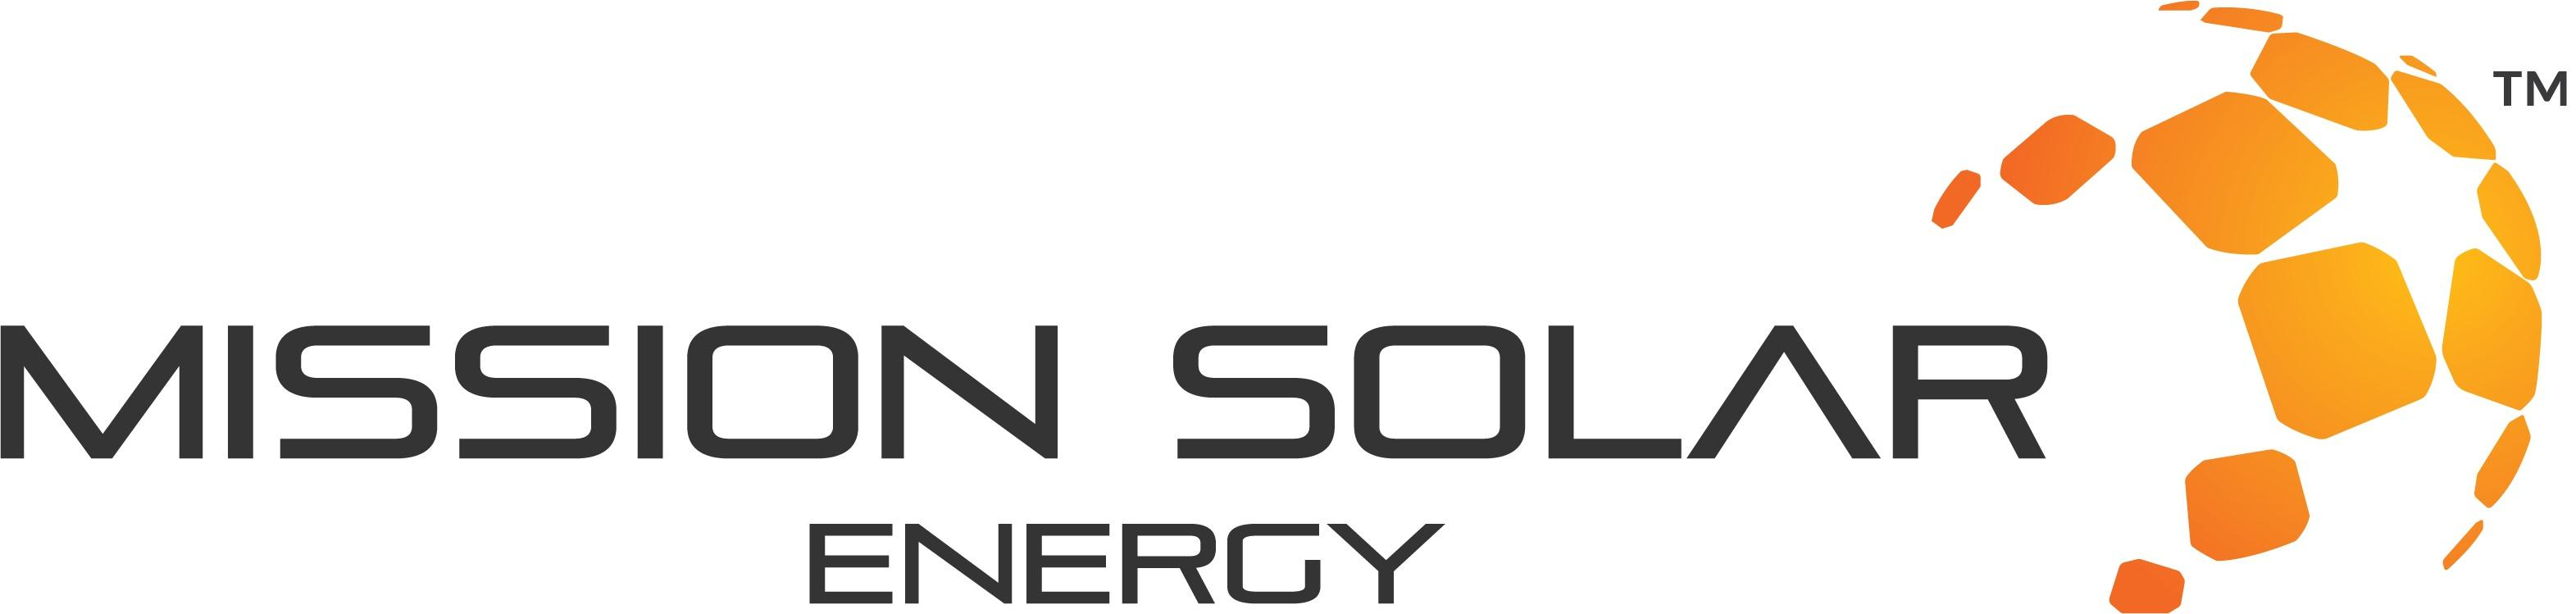 Mission Solar: MSE305SQ5K